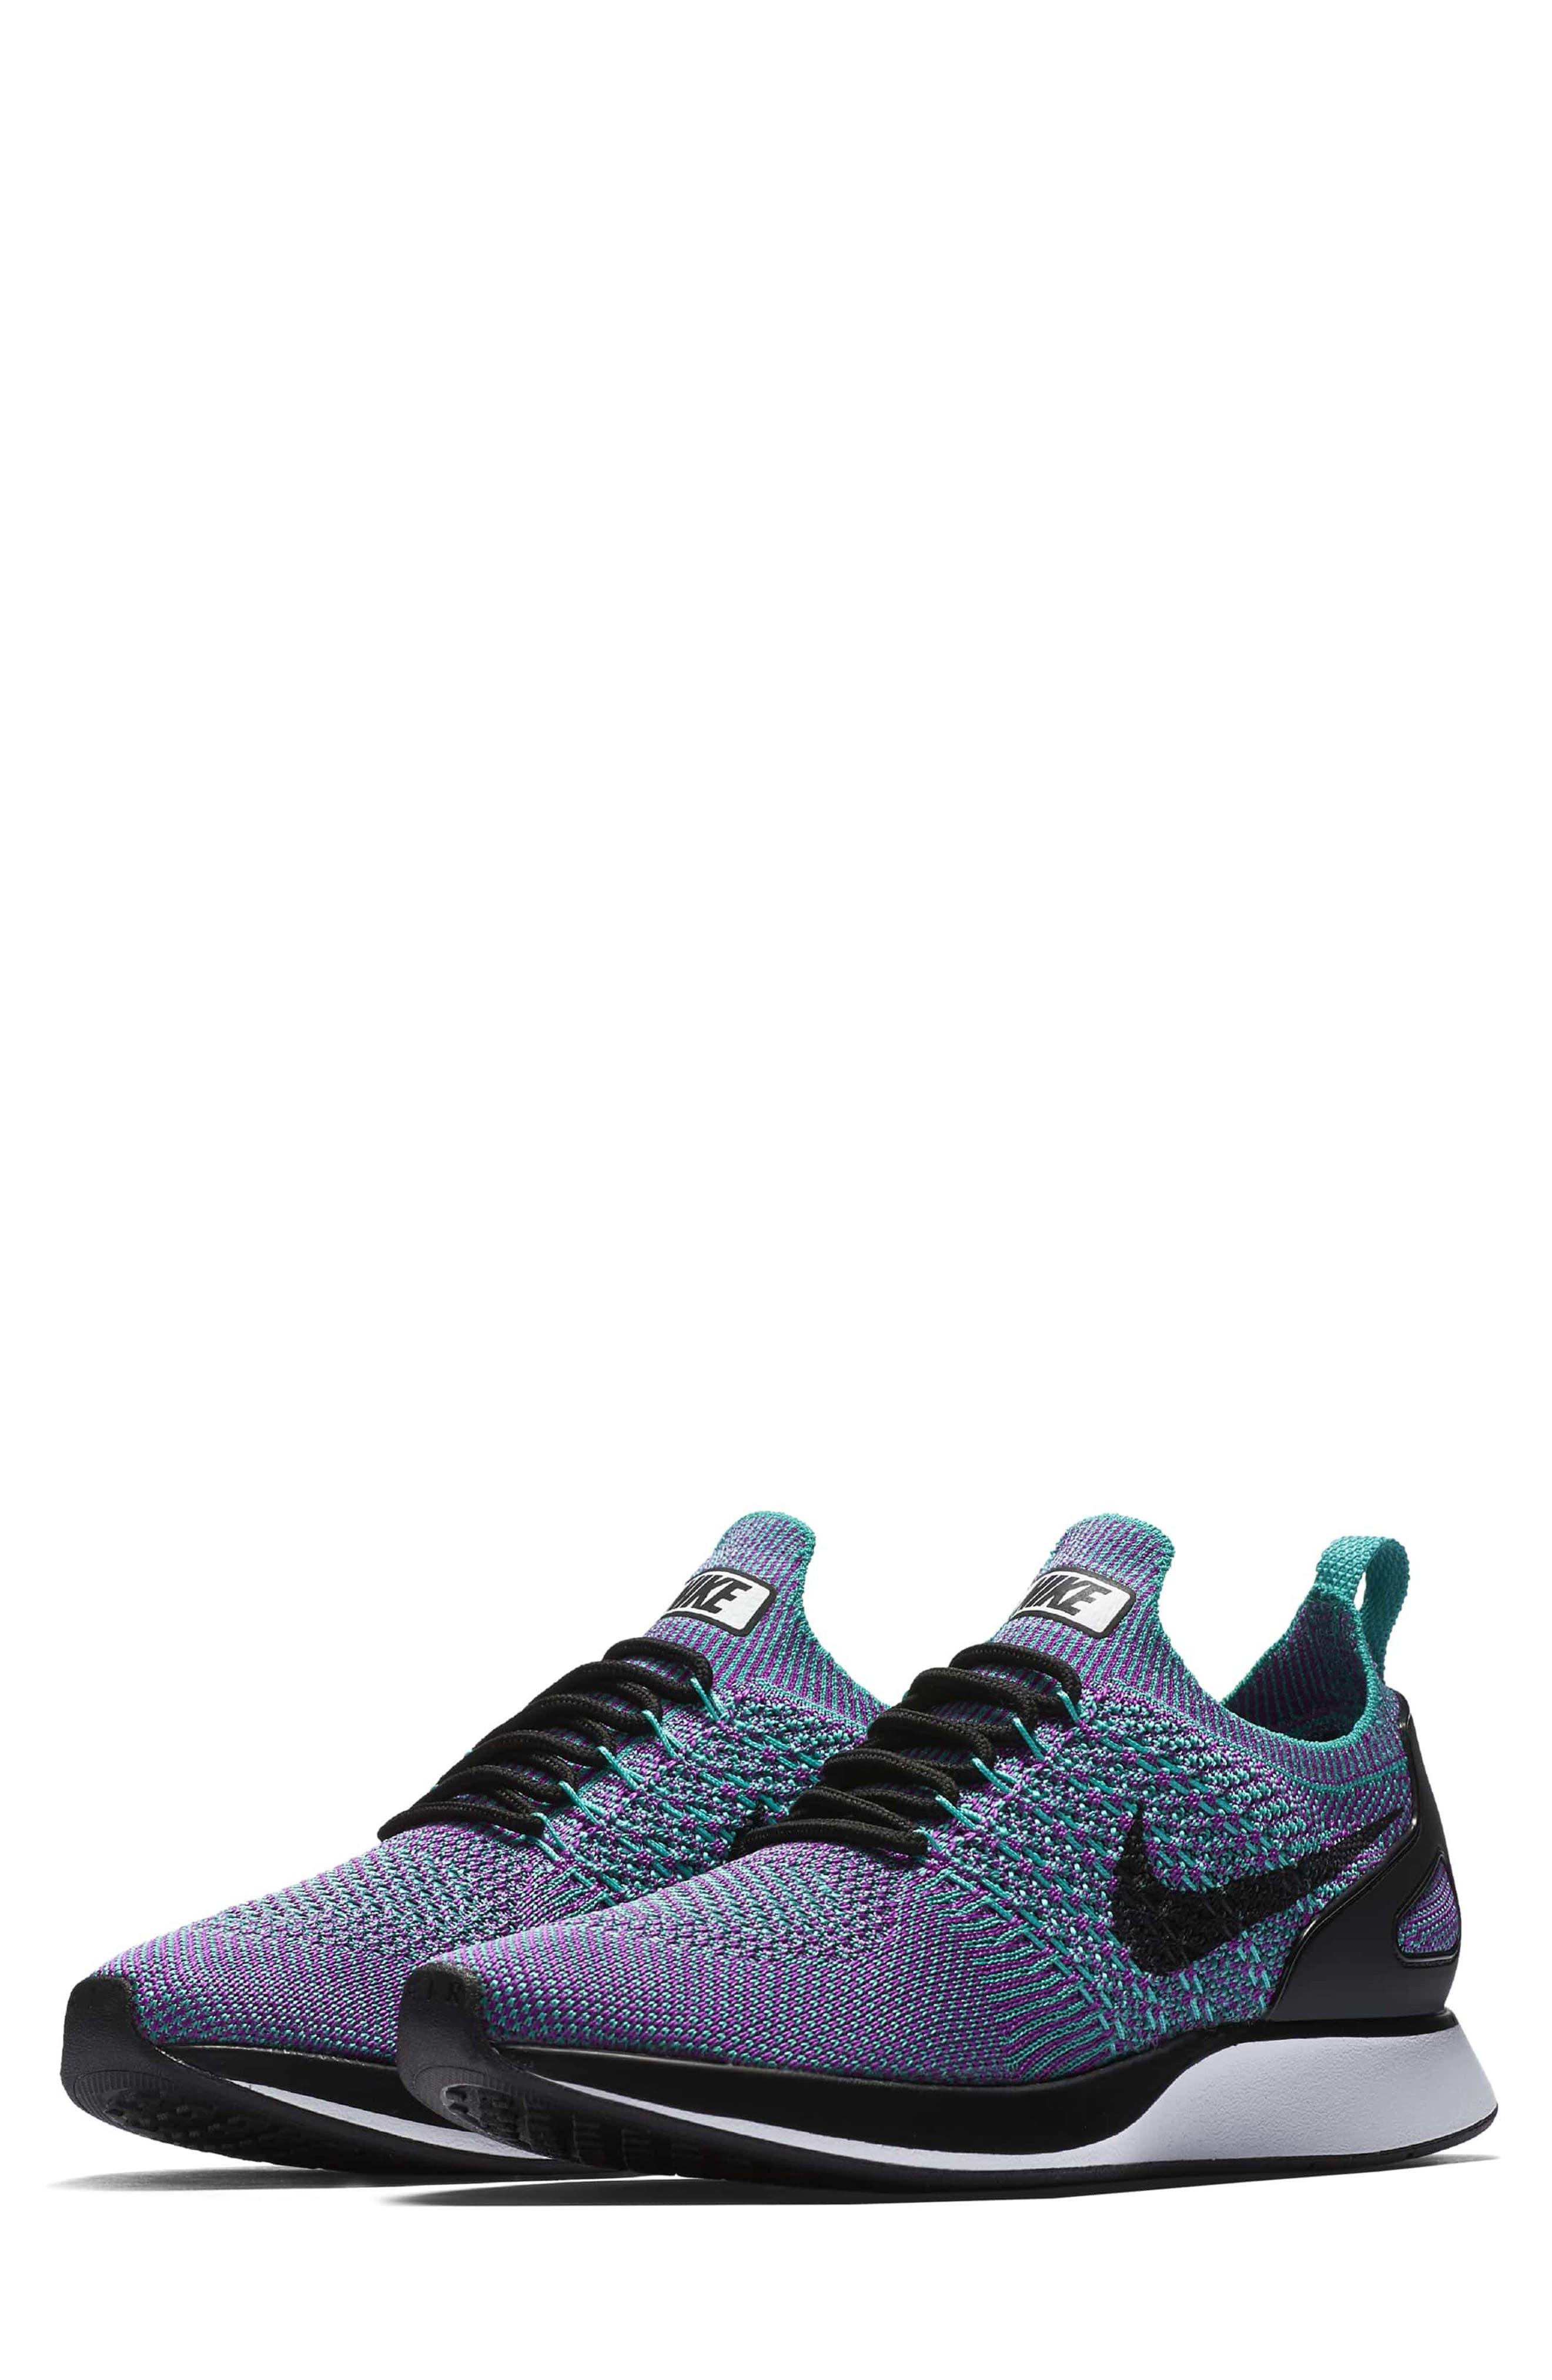 Alternate Image 1 Selected - Nike Air Zoom Mariah Flyknit Racer Sneaker (Women)